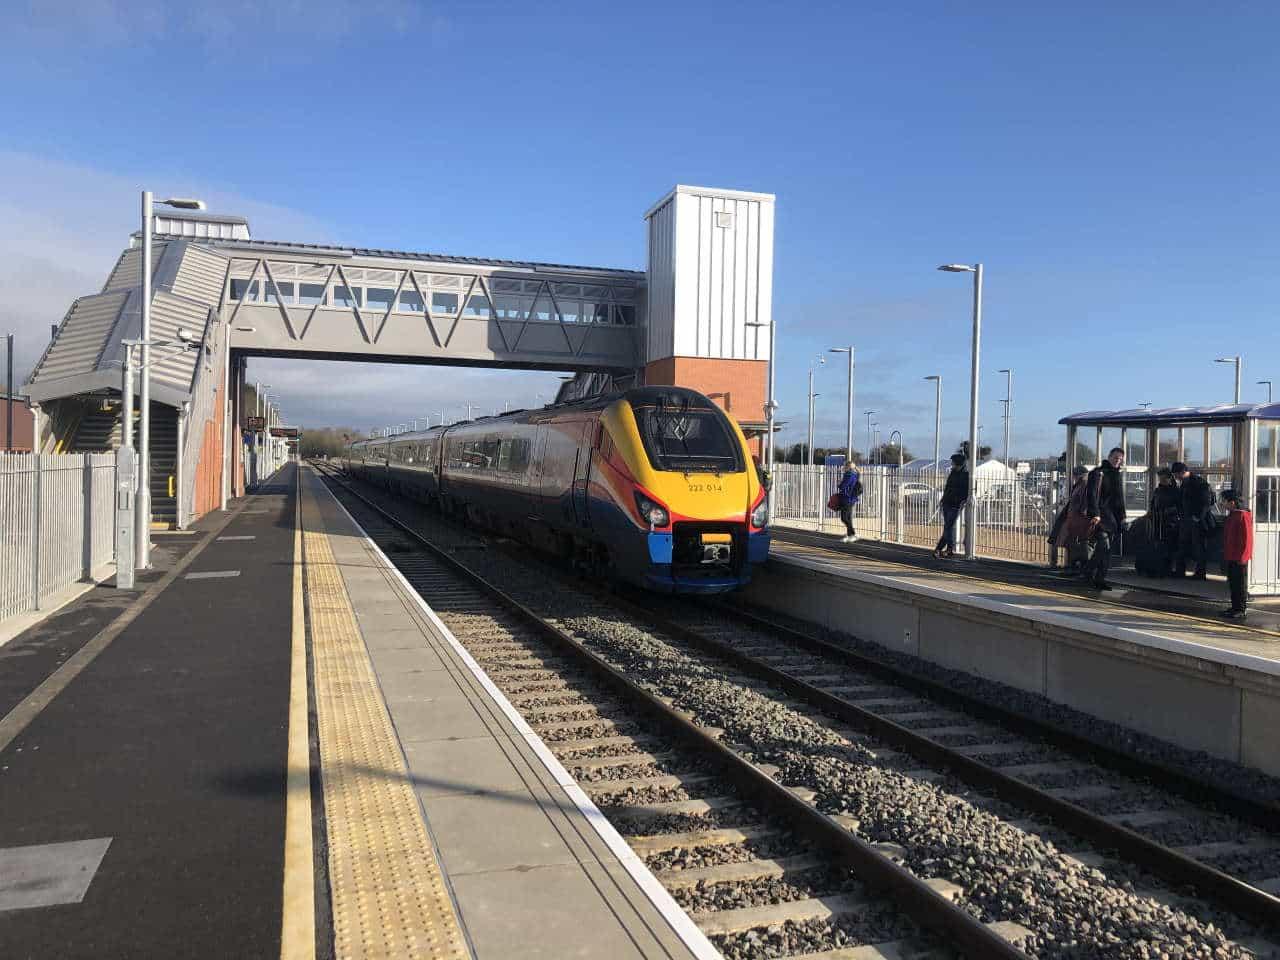 New platform at Market Harborough